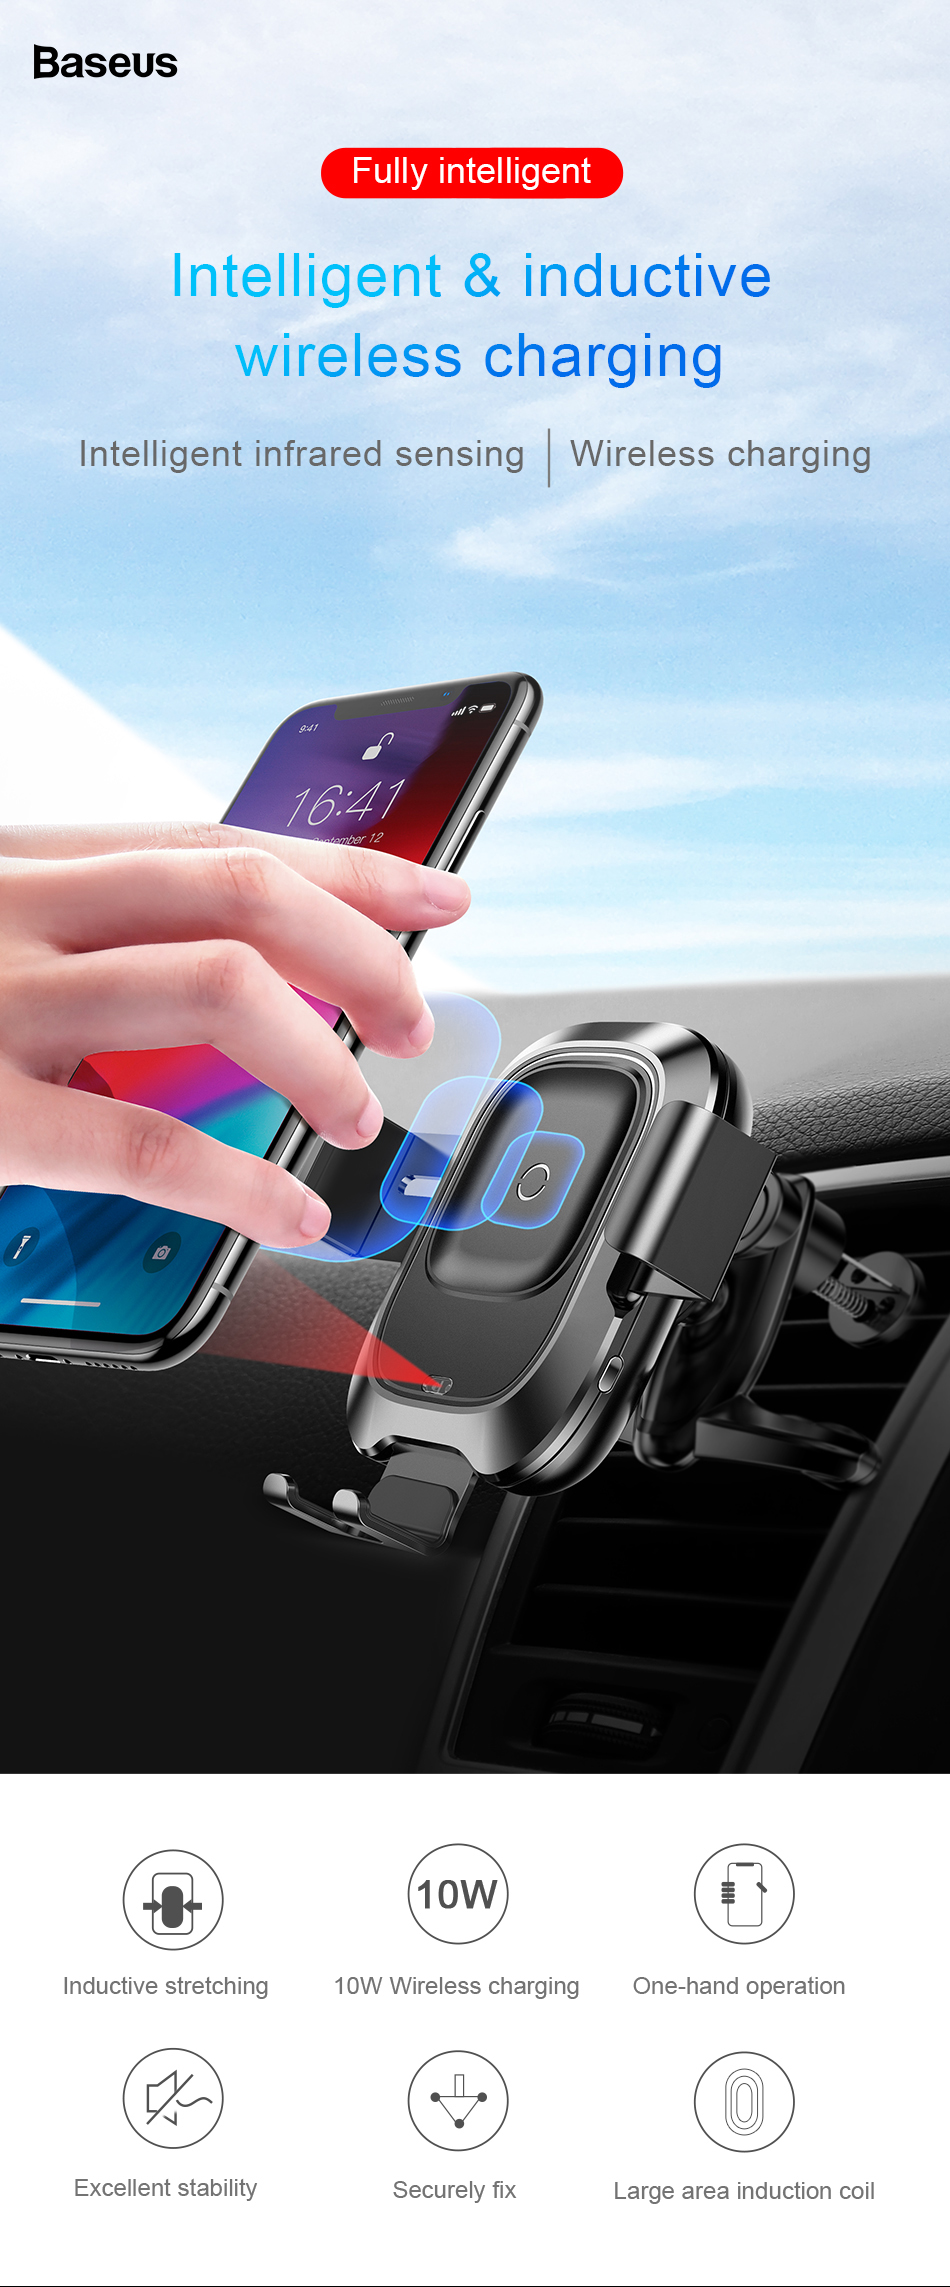 HTB1TjyBXoLrK1Rjy0Fjq6zYXFXa7 - Baseus Qi Car Wireless Charger For iPhone Xs Max XR X Samsung Intelligent Infrared Sensor Fast Wirless Charging Car Phone Holder